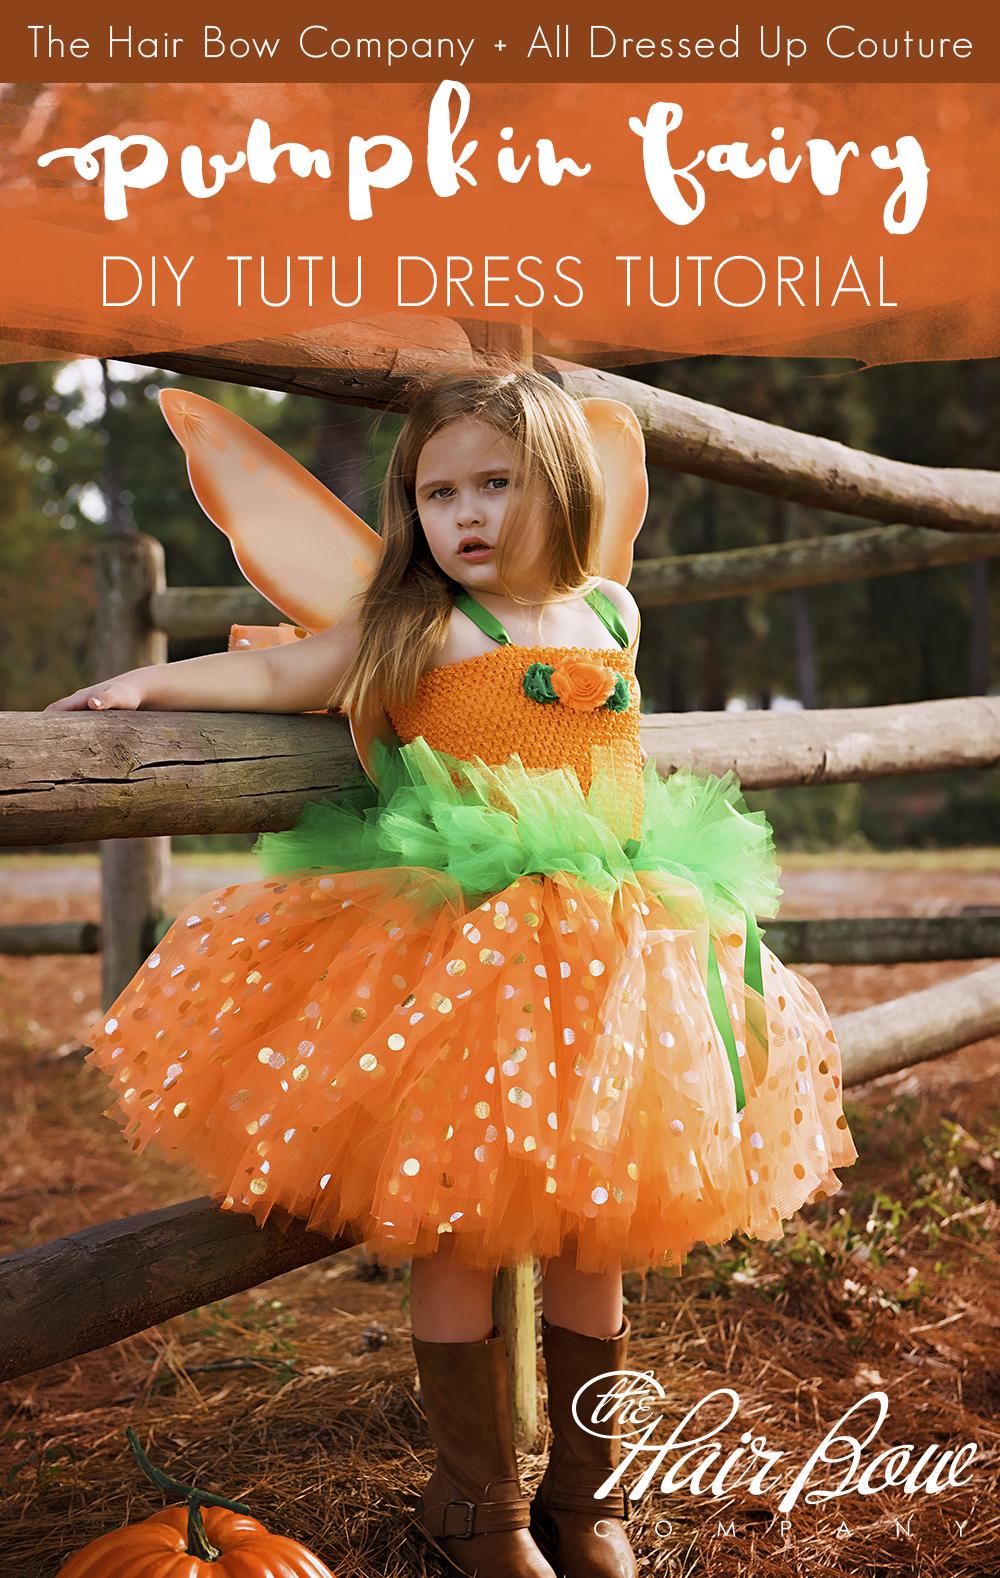 c6be3884e Autumn Pumpkin Fairy Tutu Dress DIY Tutorial - The Hair Bow Company ...